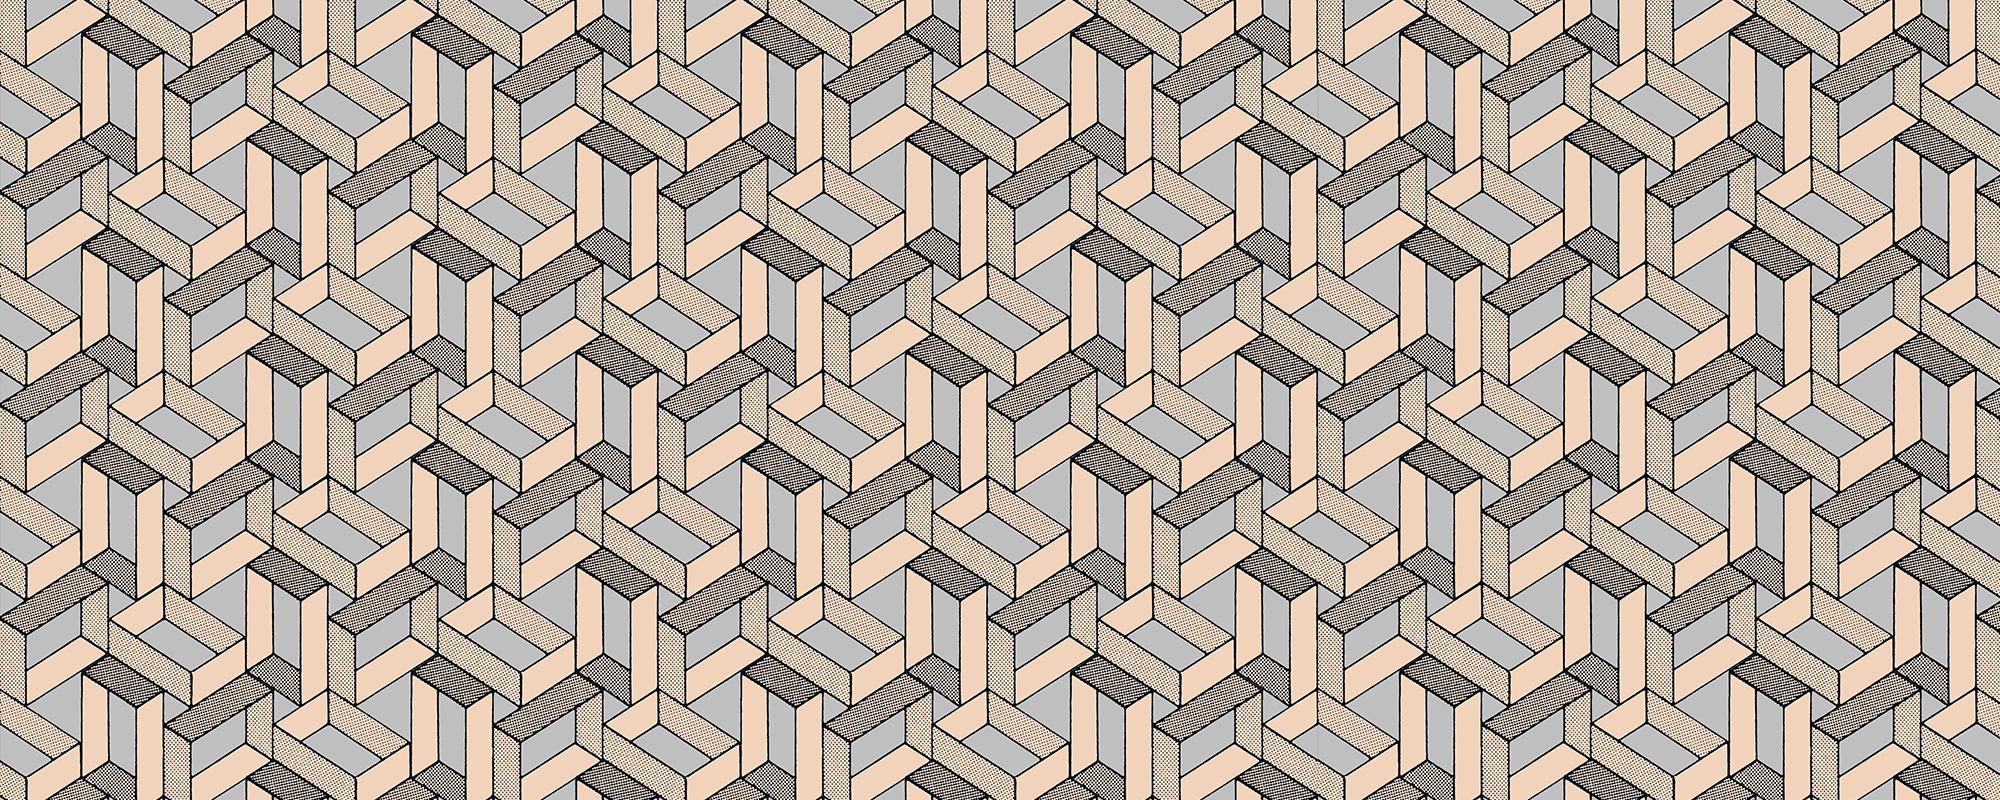 Papier peint original motif graphique inspiration Escher